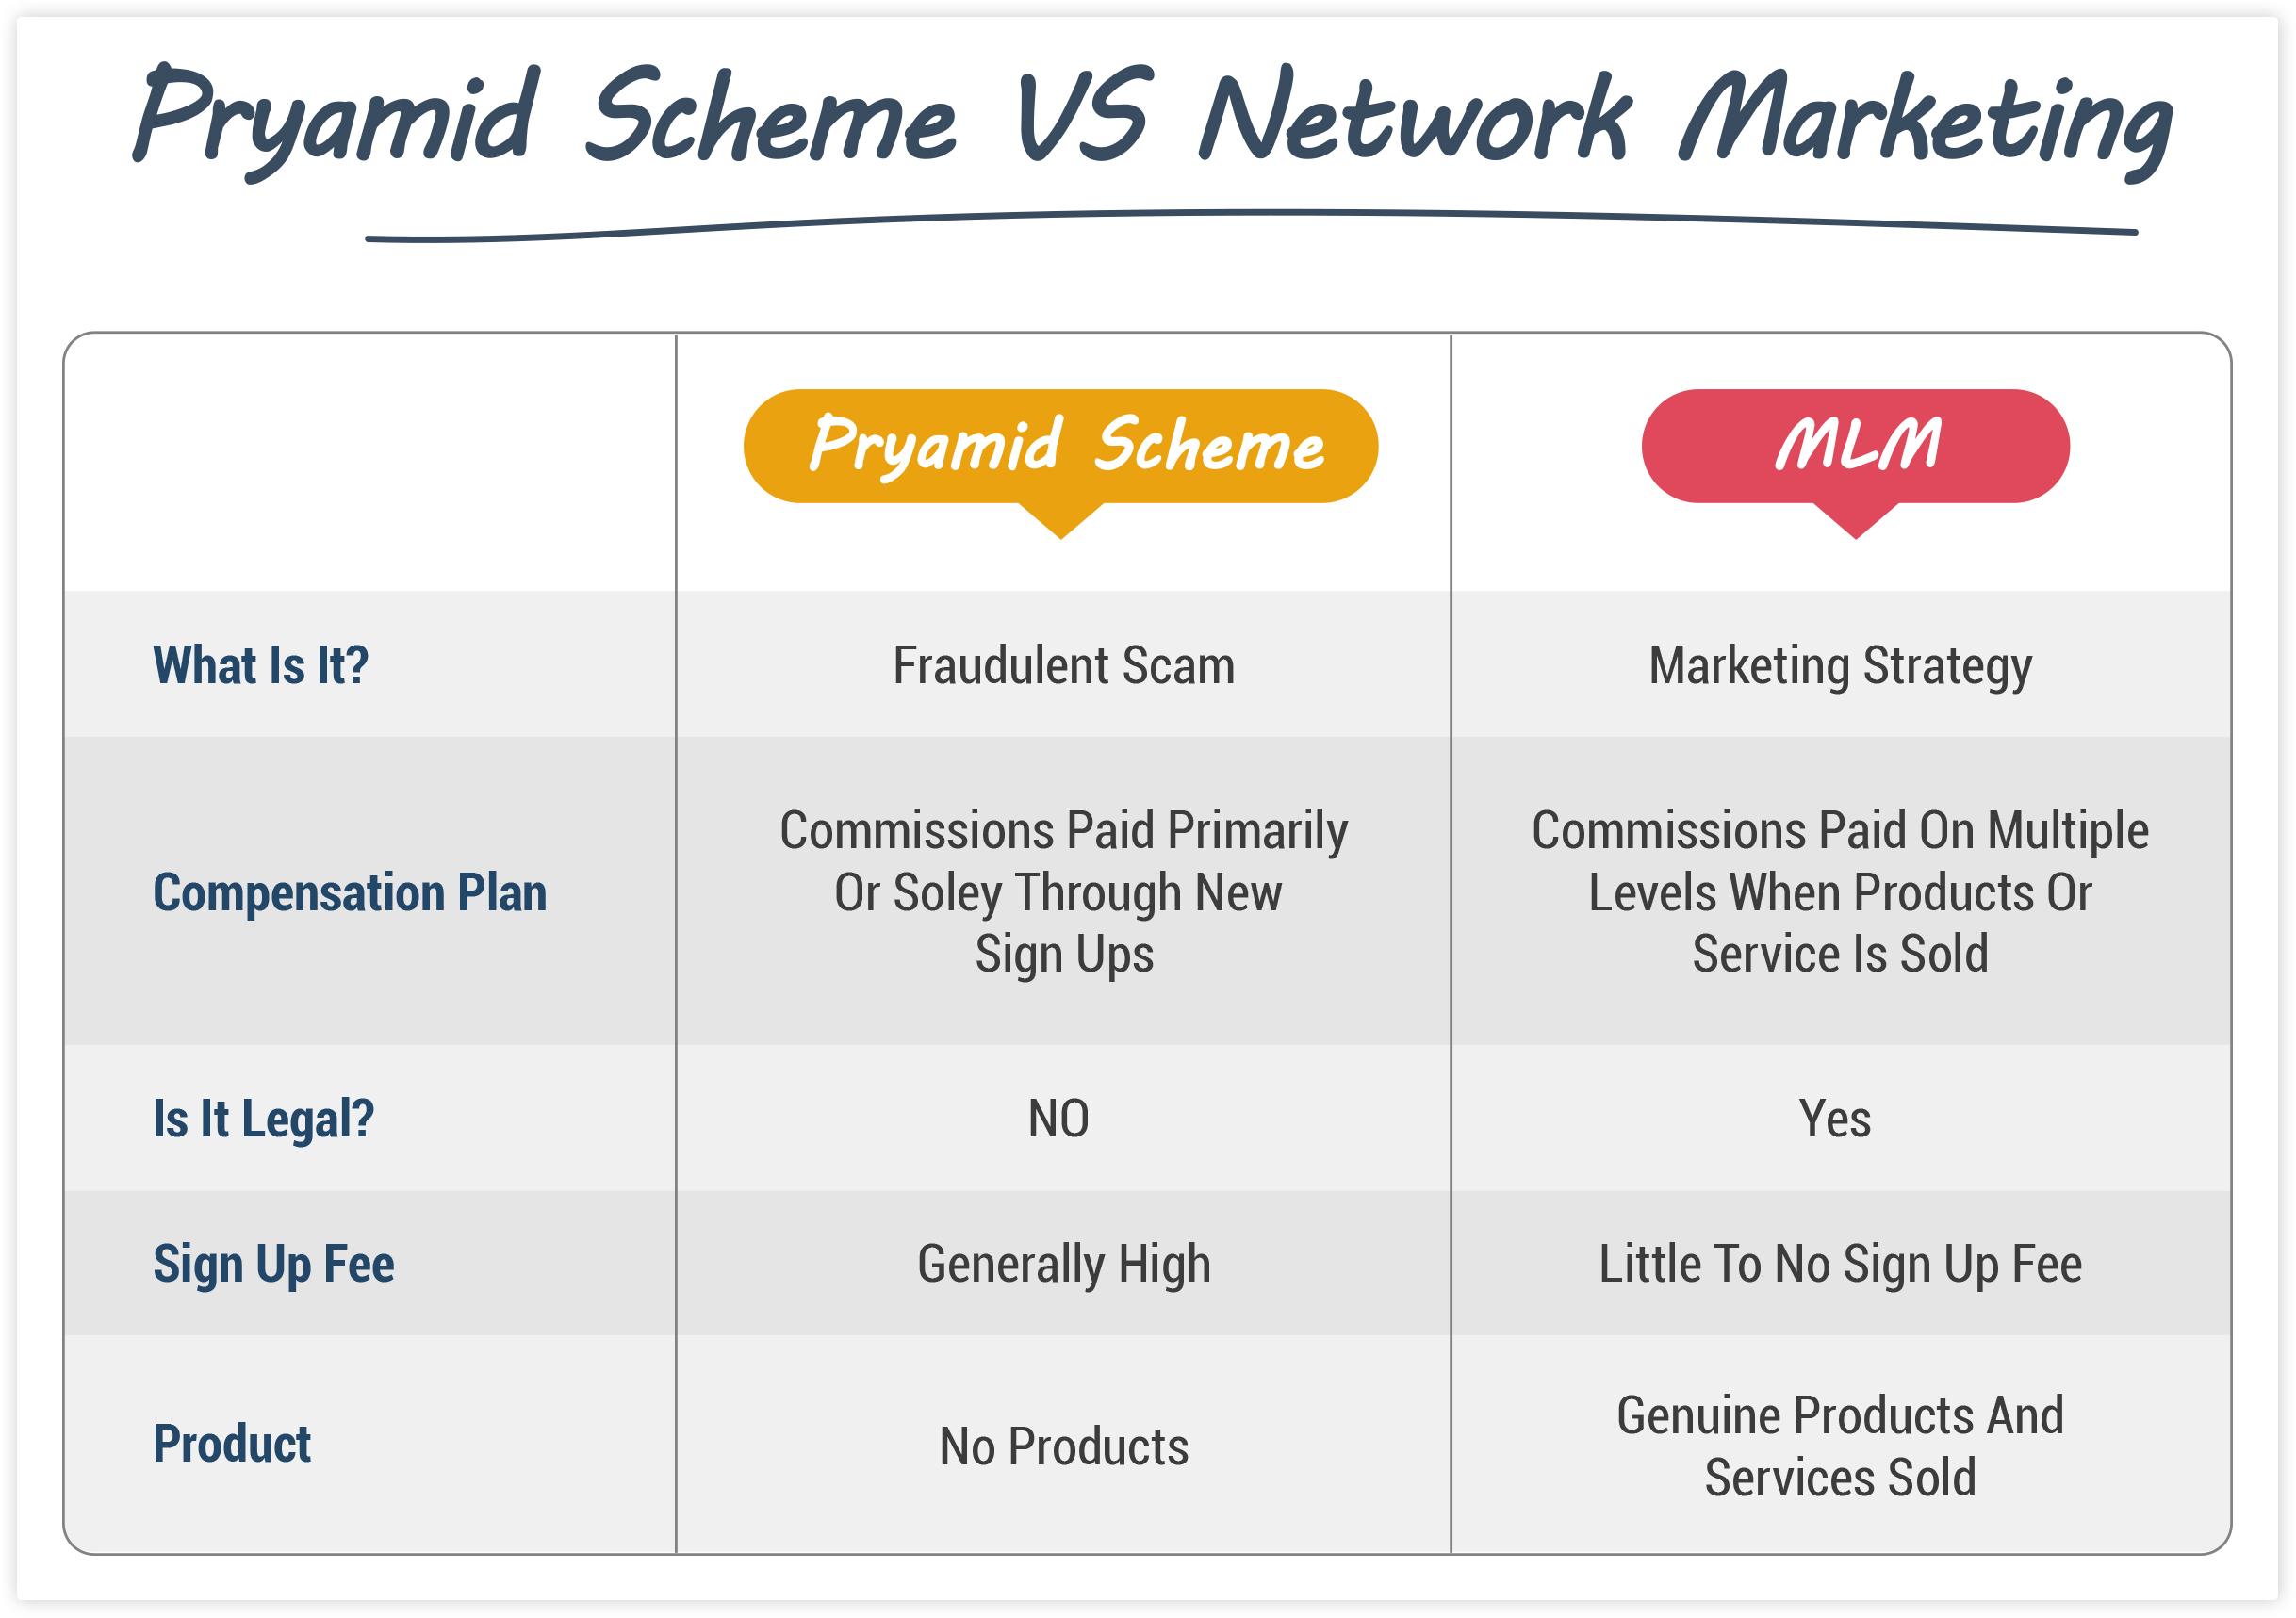 Pyramid Scheme vs Network Marketing